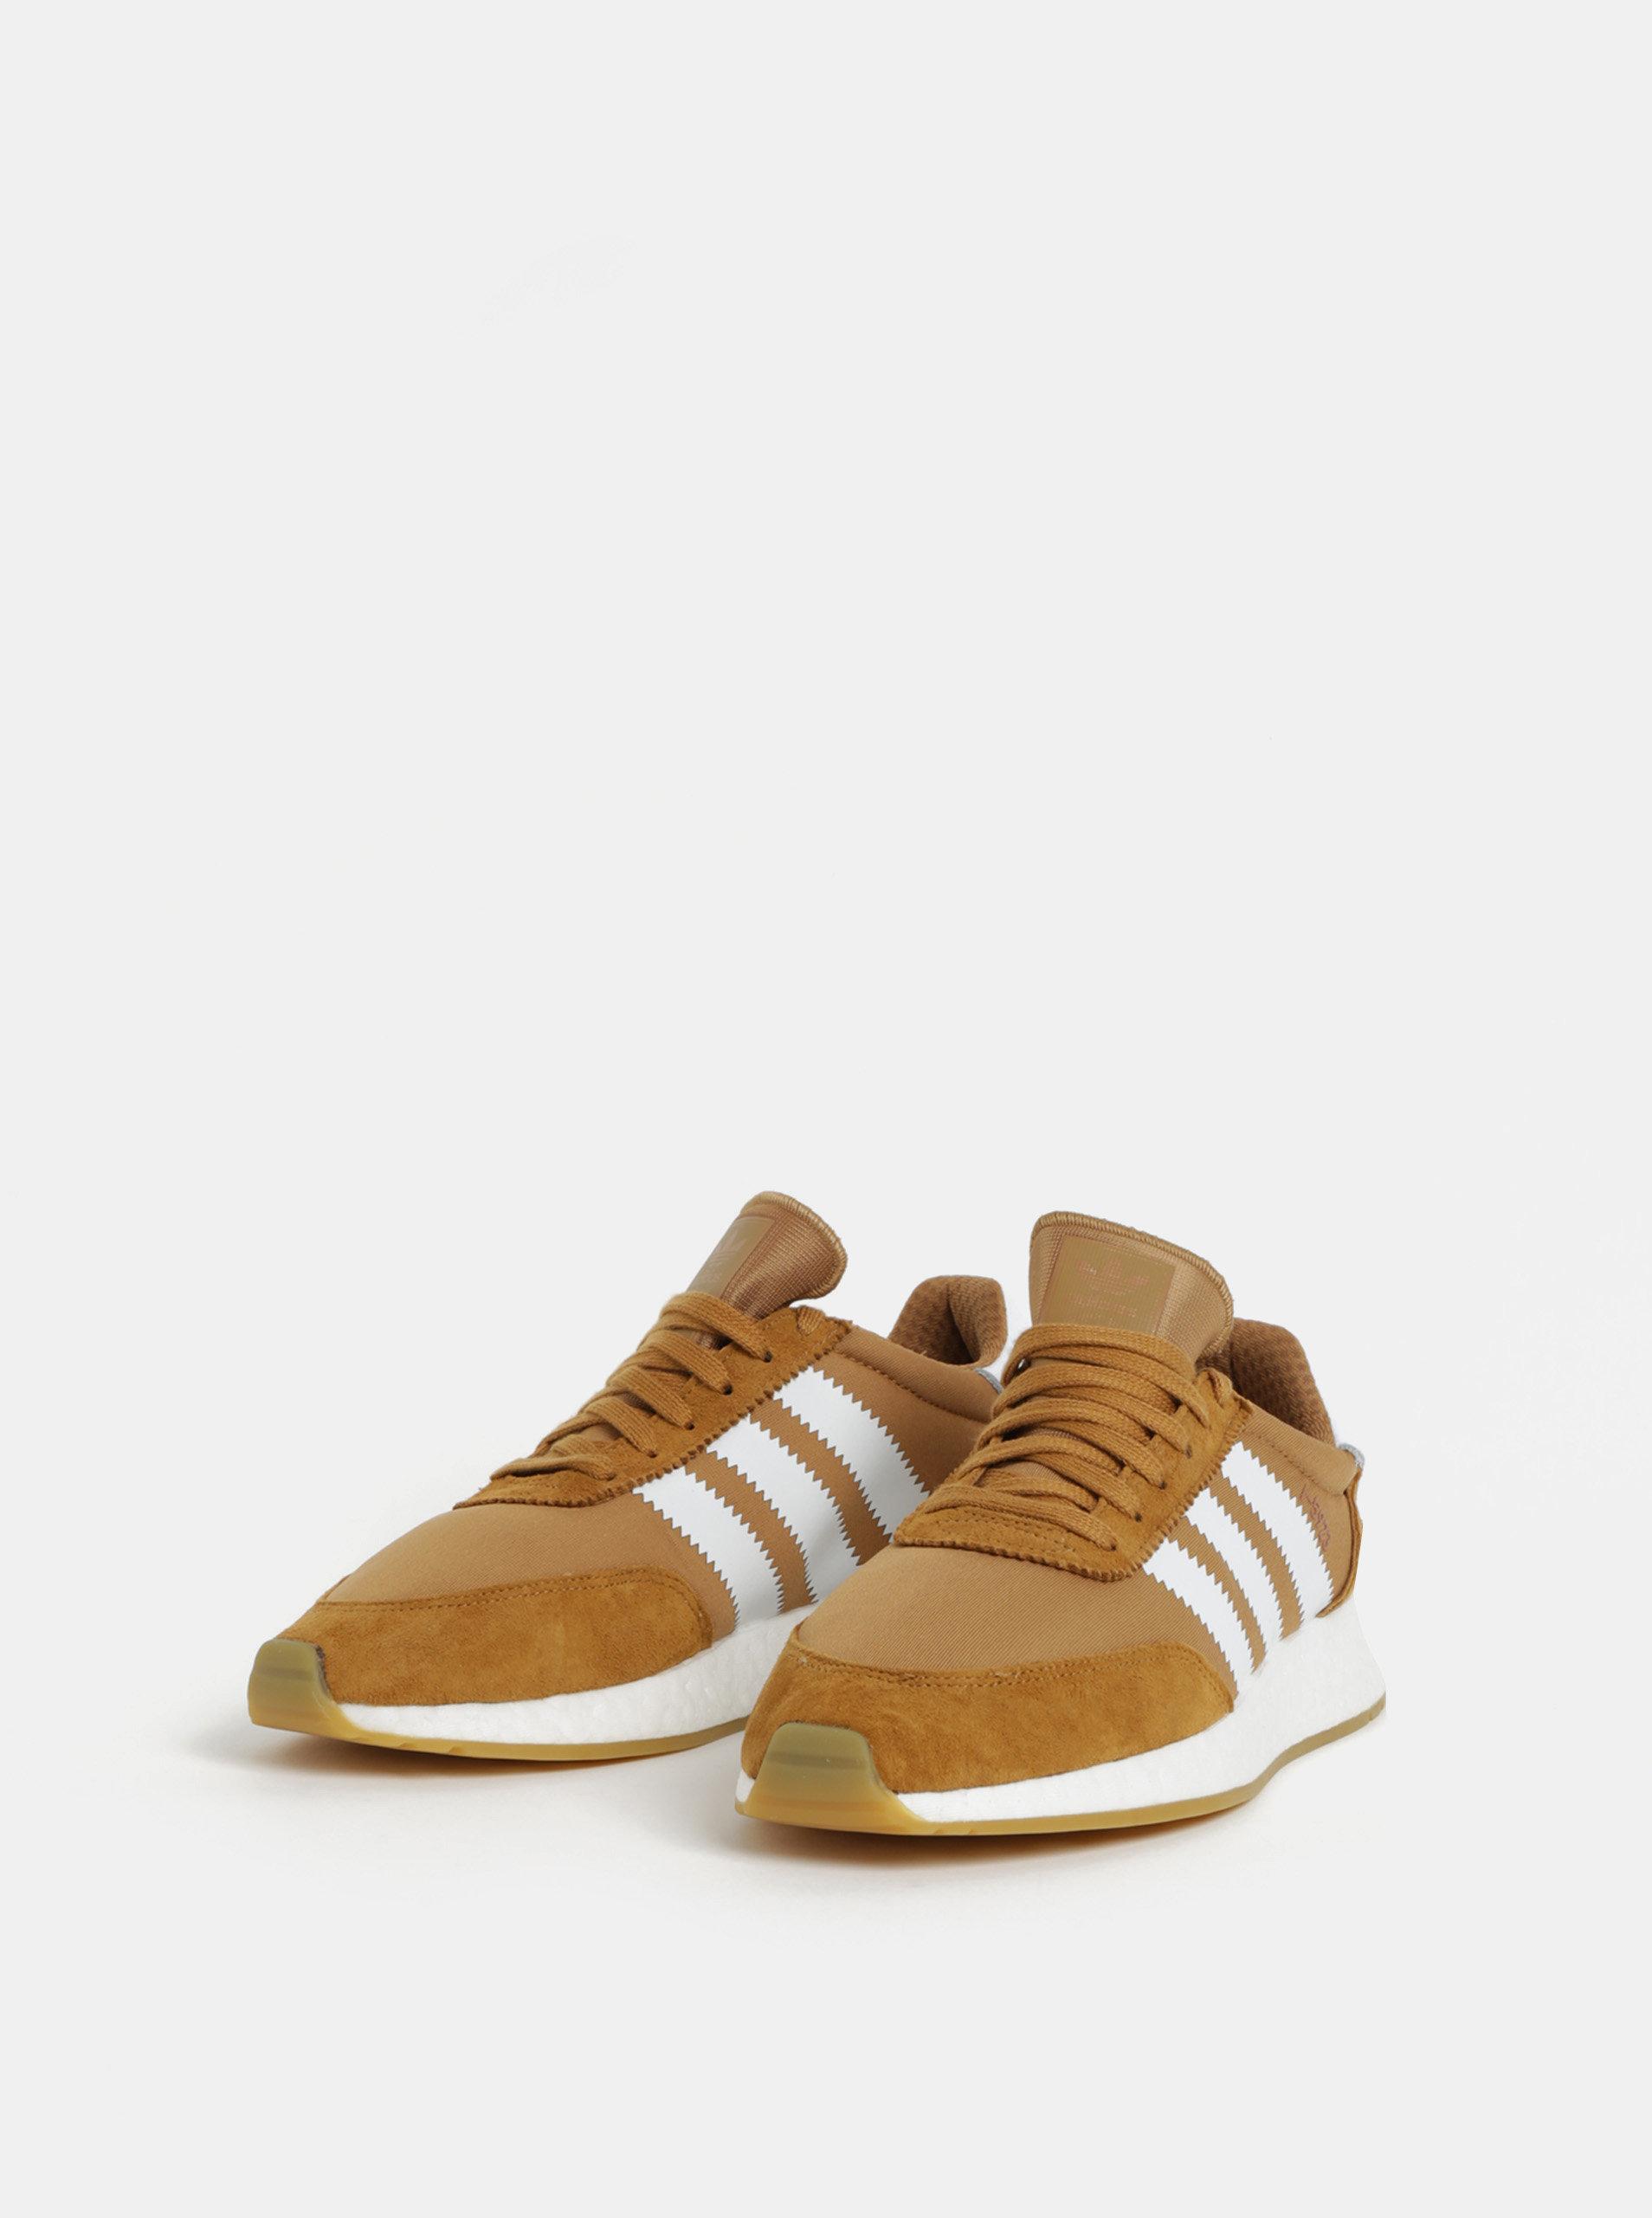 Hnědé pánské tenisky adidas Originals Iniki Runner ... db256e6c17b